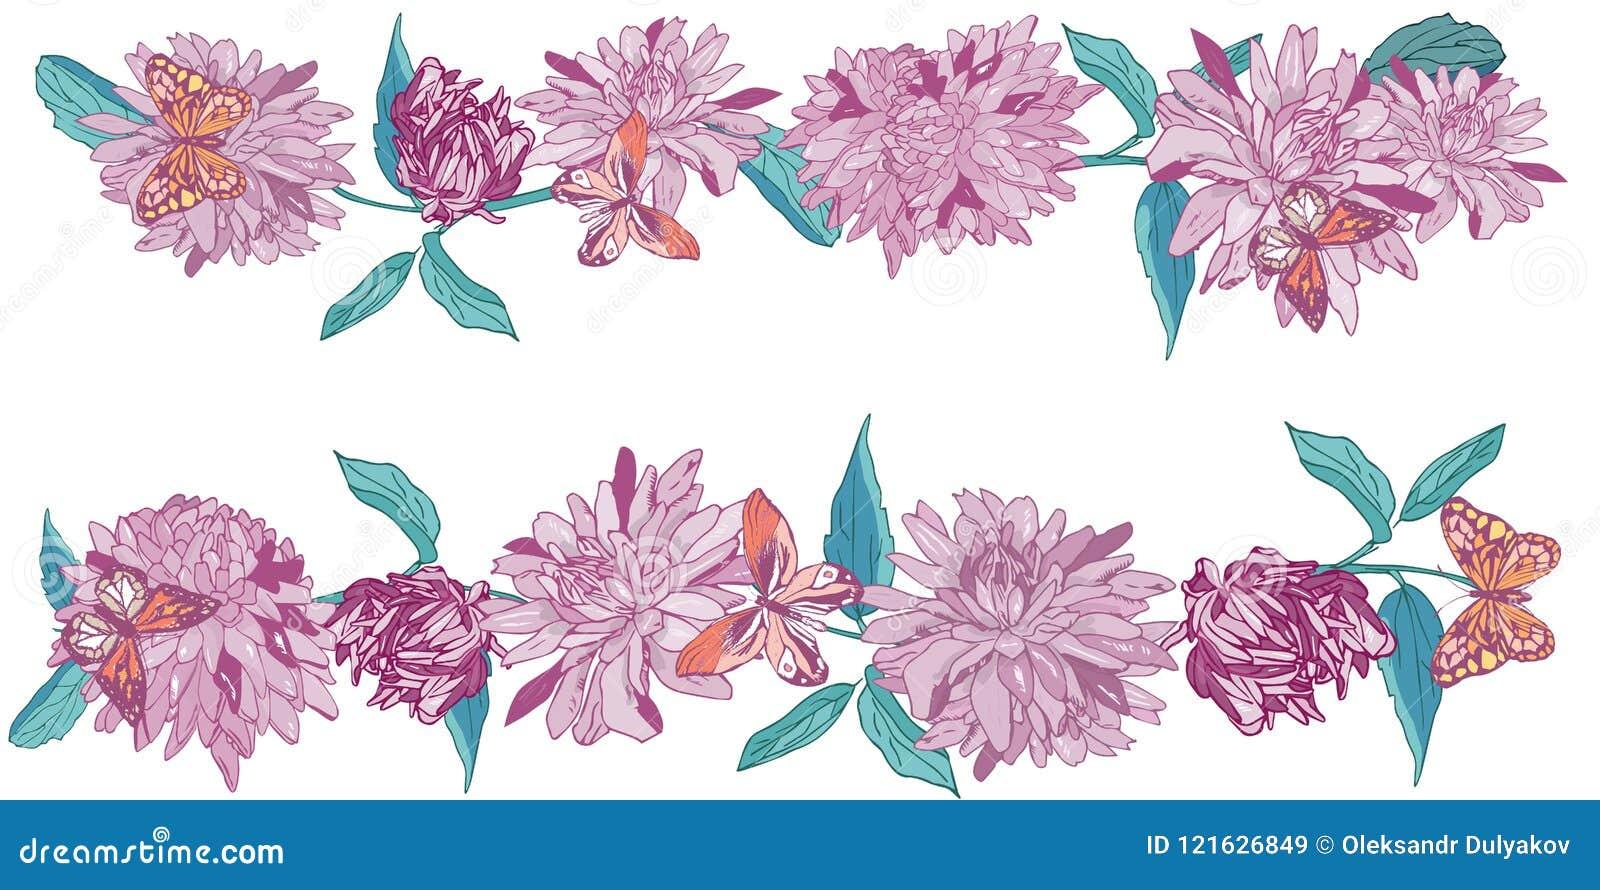 Aster with butterflies daisy flower border vector illustration aster with butterflies daisy flower border vector illustration izmirmasajfo